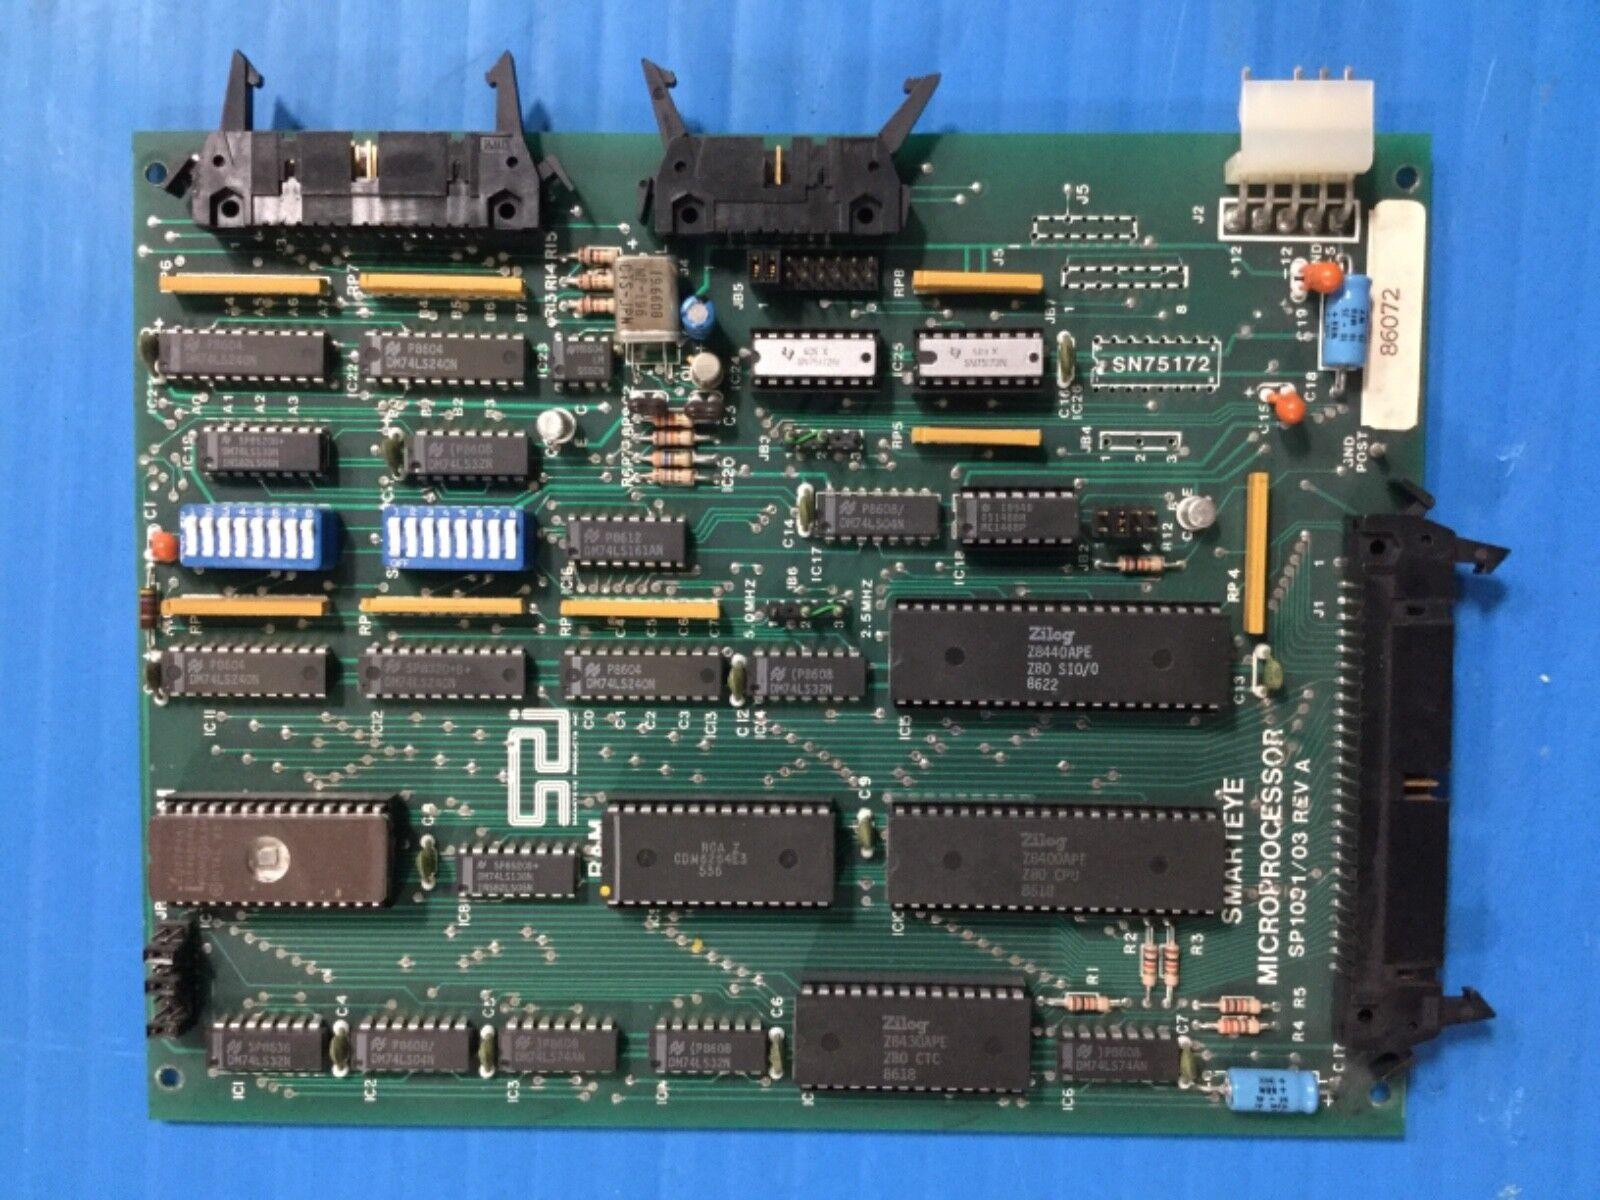 Smarteye Microprocessor SP1001 03 Board Card (C27)